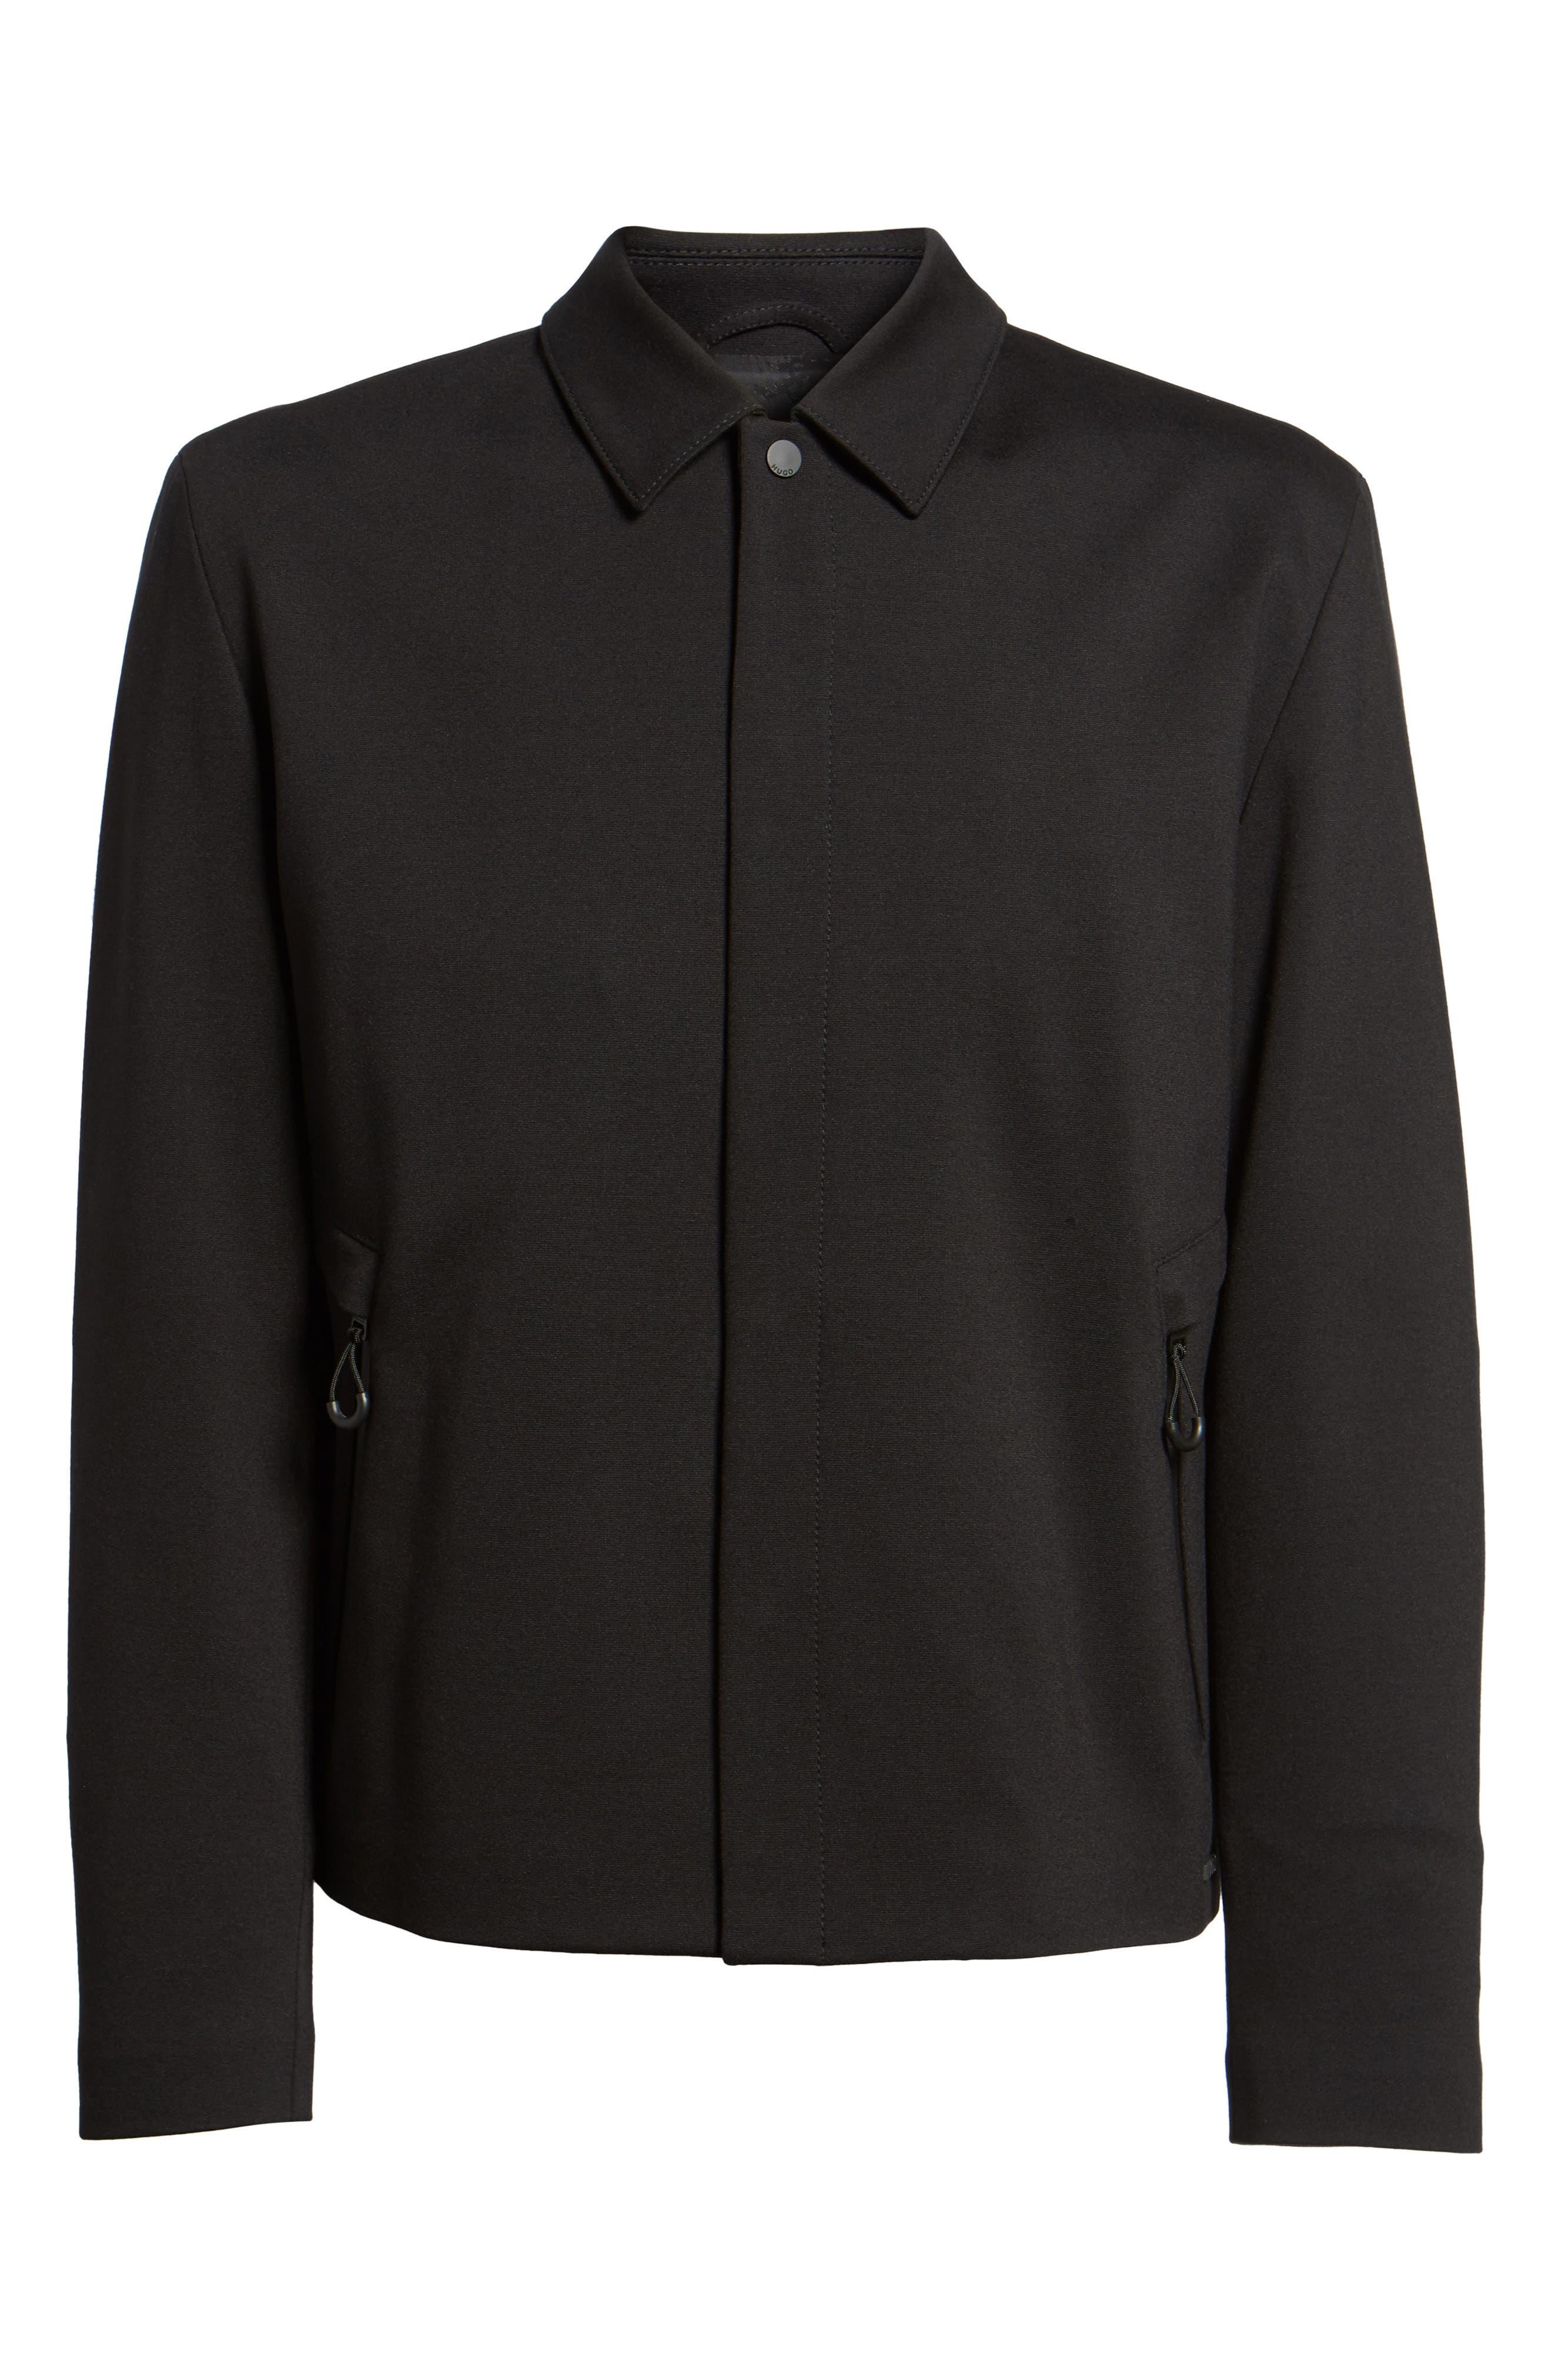 Hugo Boss Babenu Shirt Jacket,                             Alternate thumbnail 5, color,